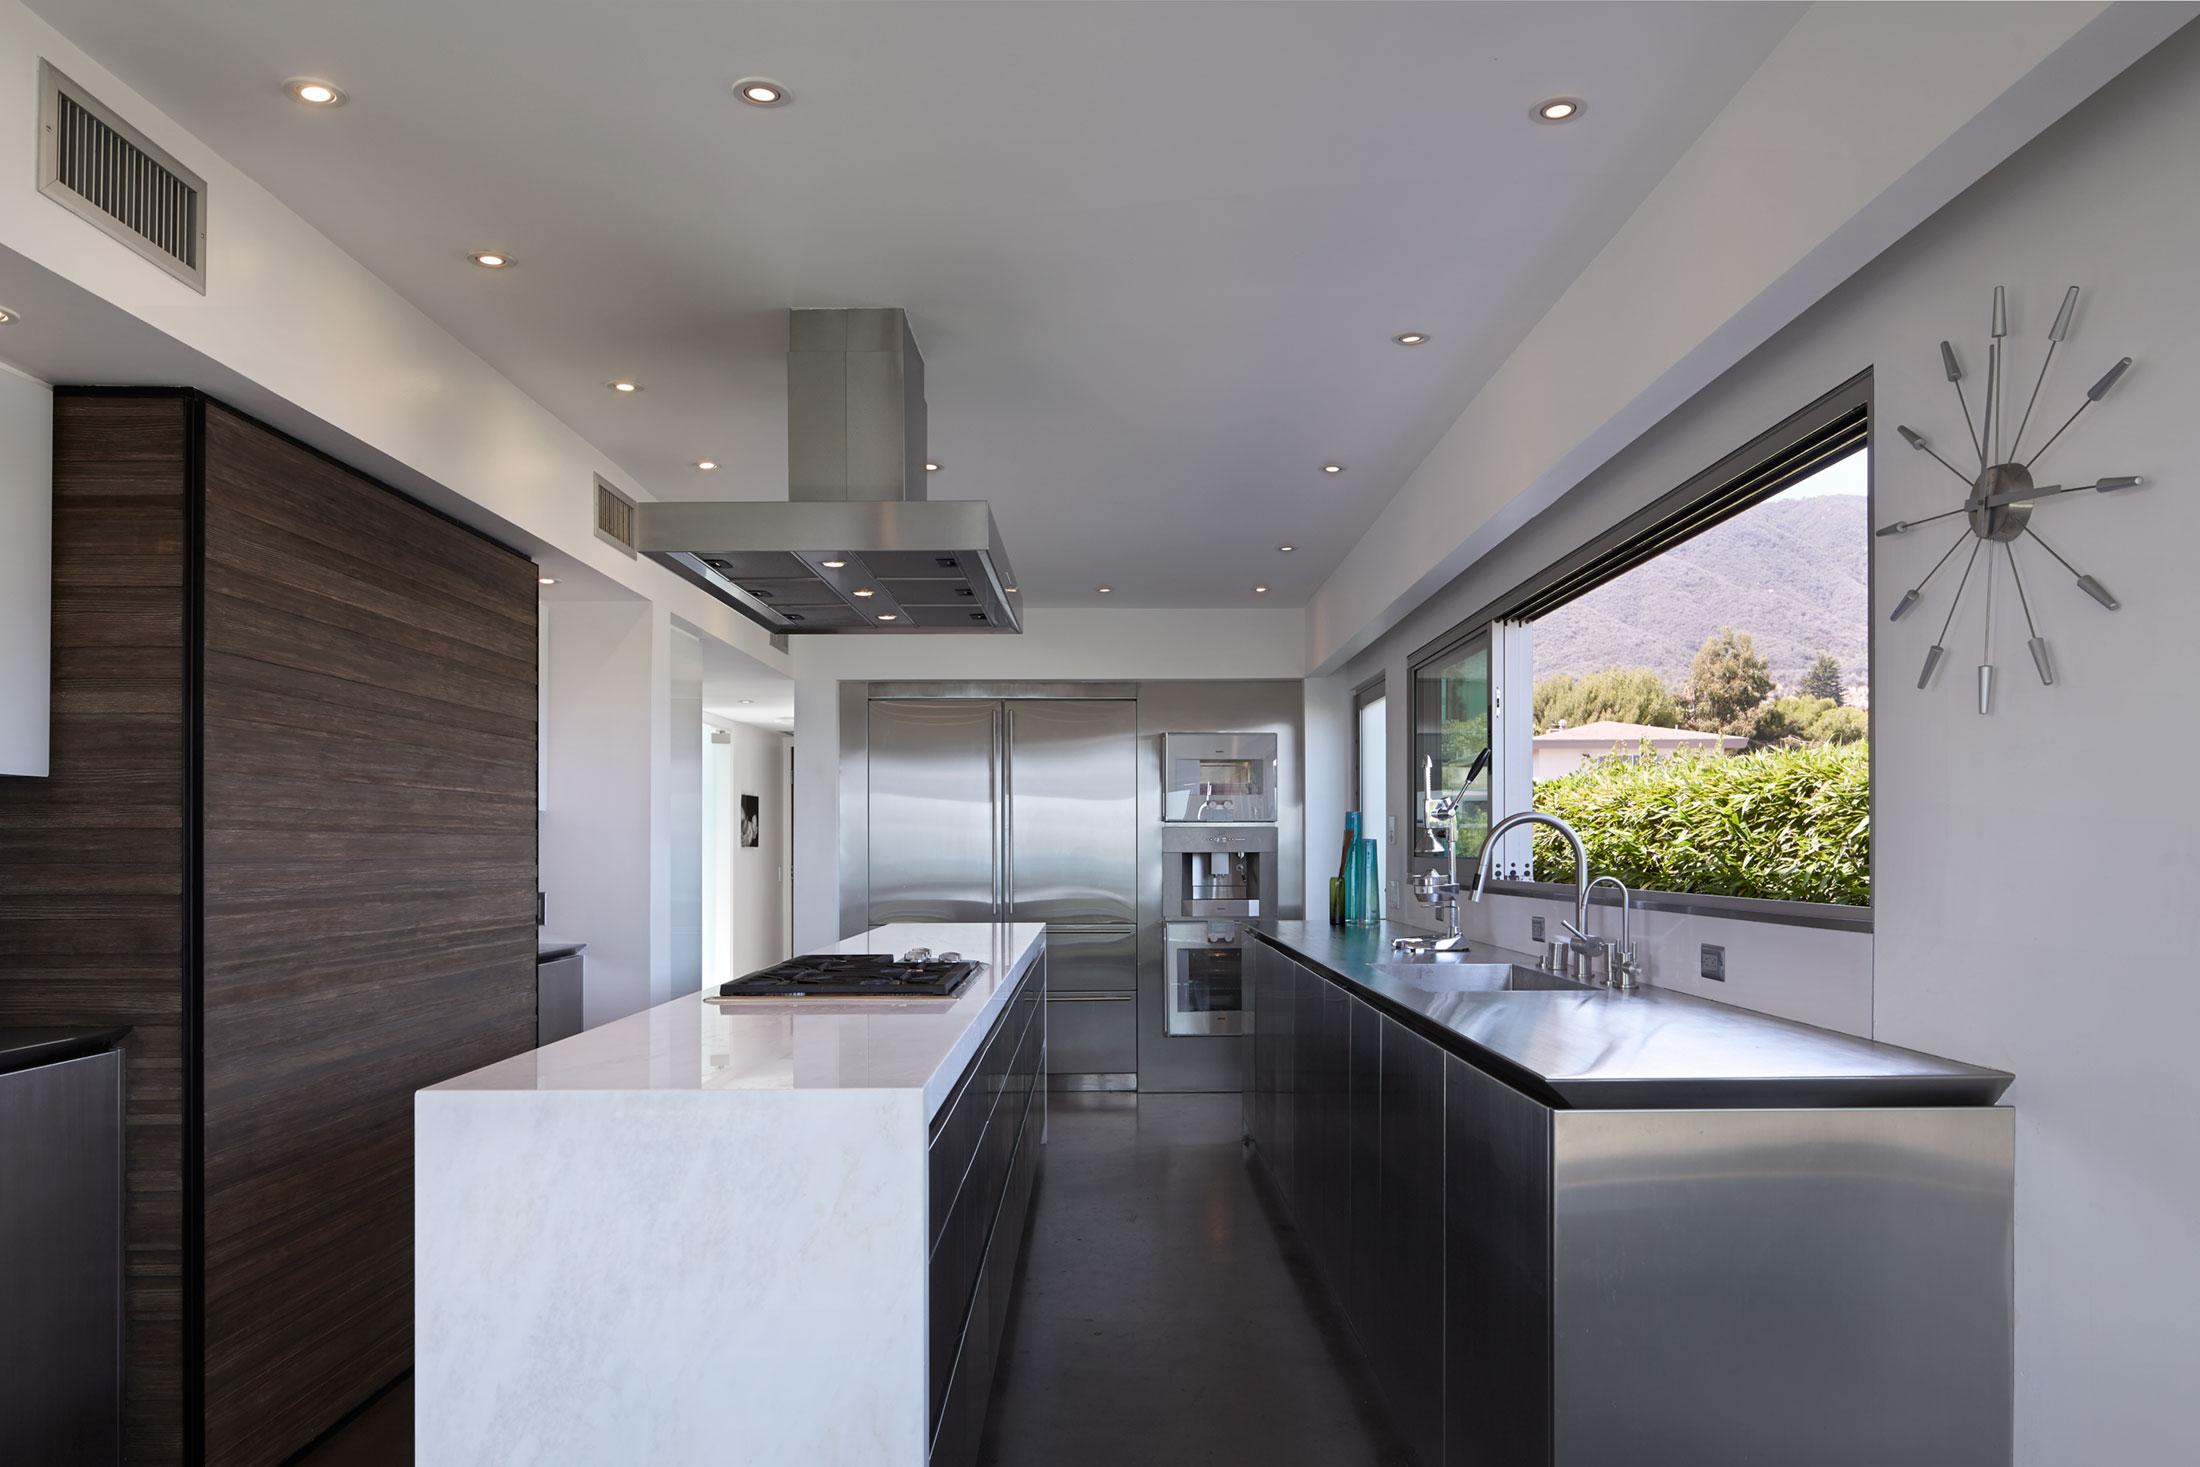 modern-architecture-residential-interior-kitchen-shubindonaldson-wakecrest-residence-1